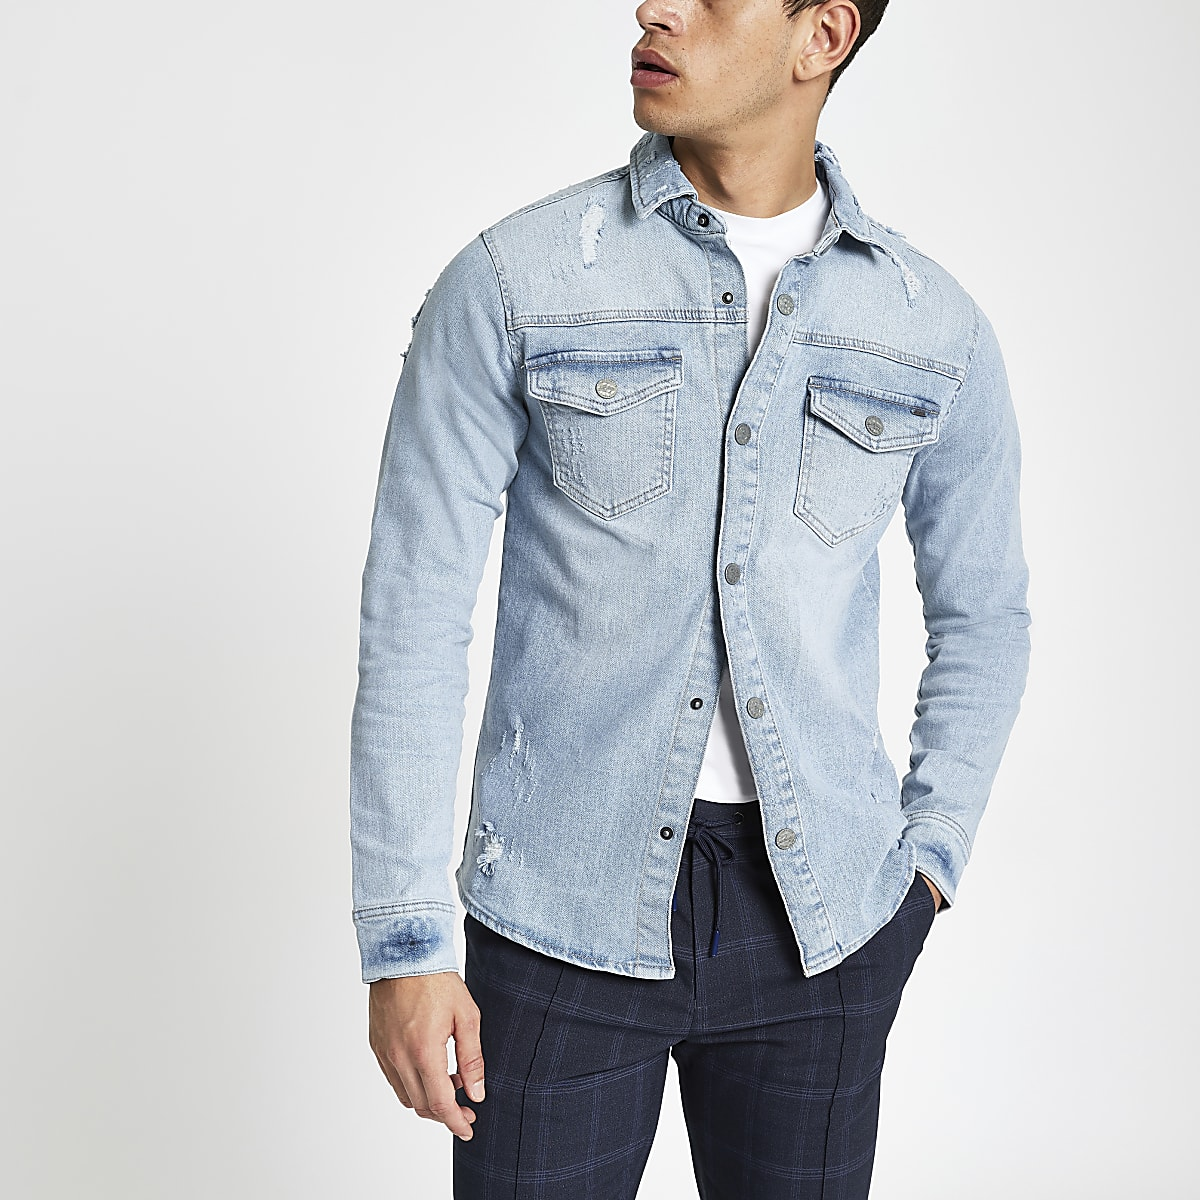 Only & Sons blue denim overshirt